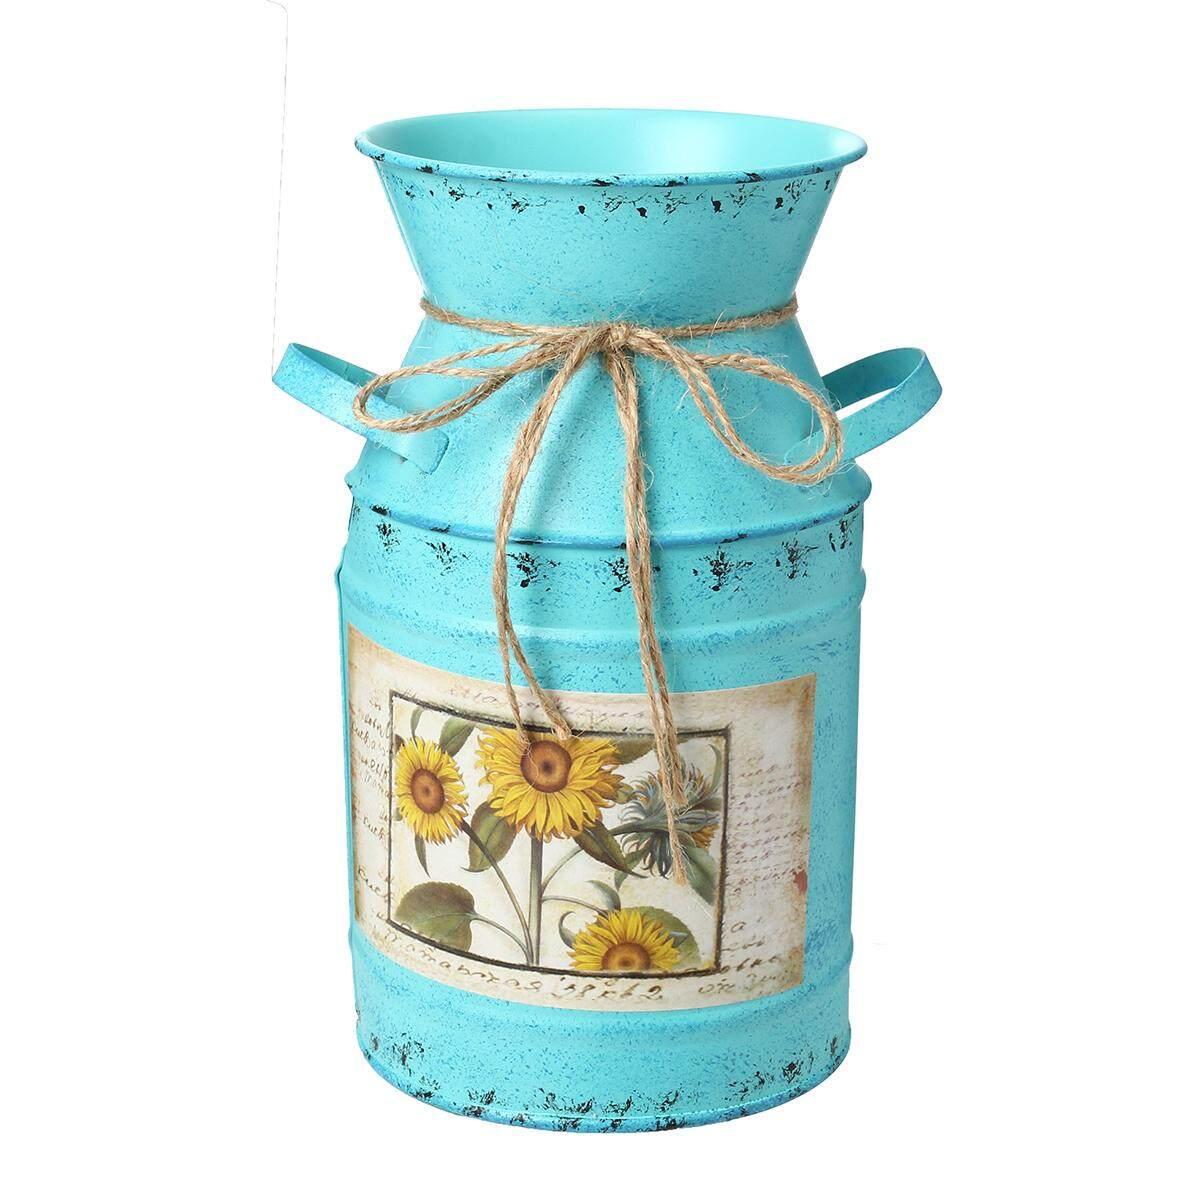 Rustic Green Metal Milk Churn Vase Planter Flower Herb Pot Novelty Ornament GIFT